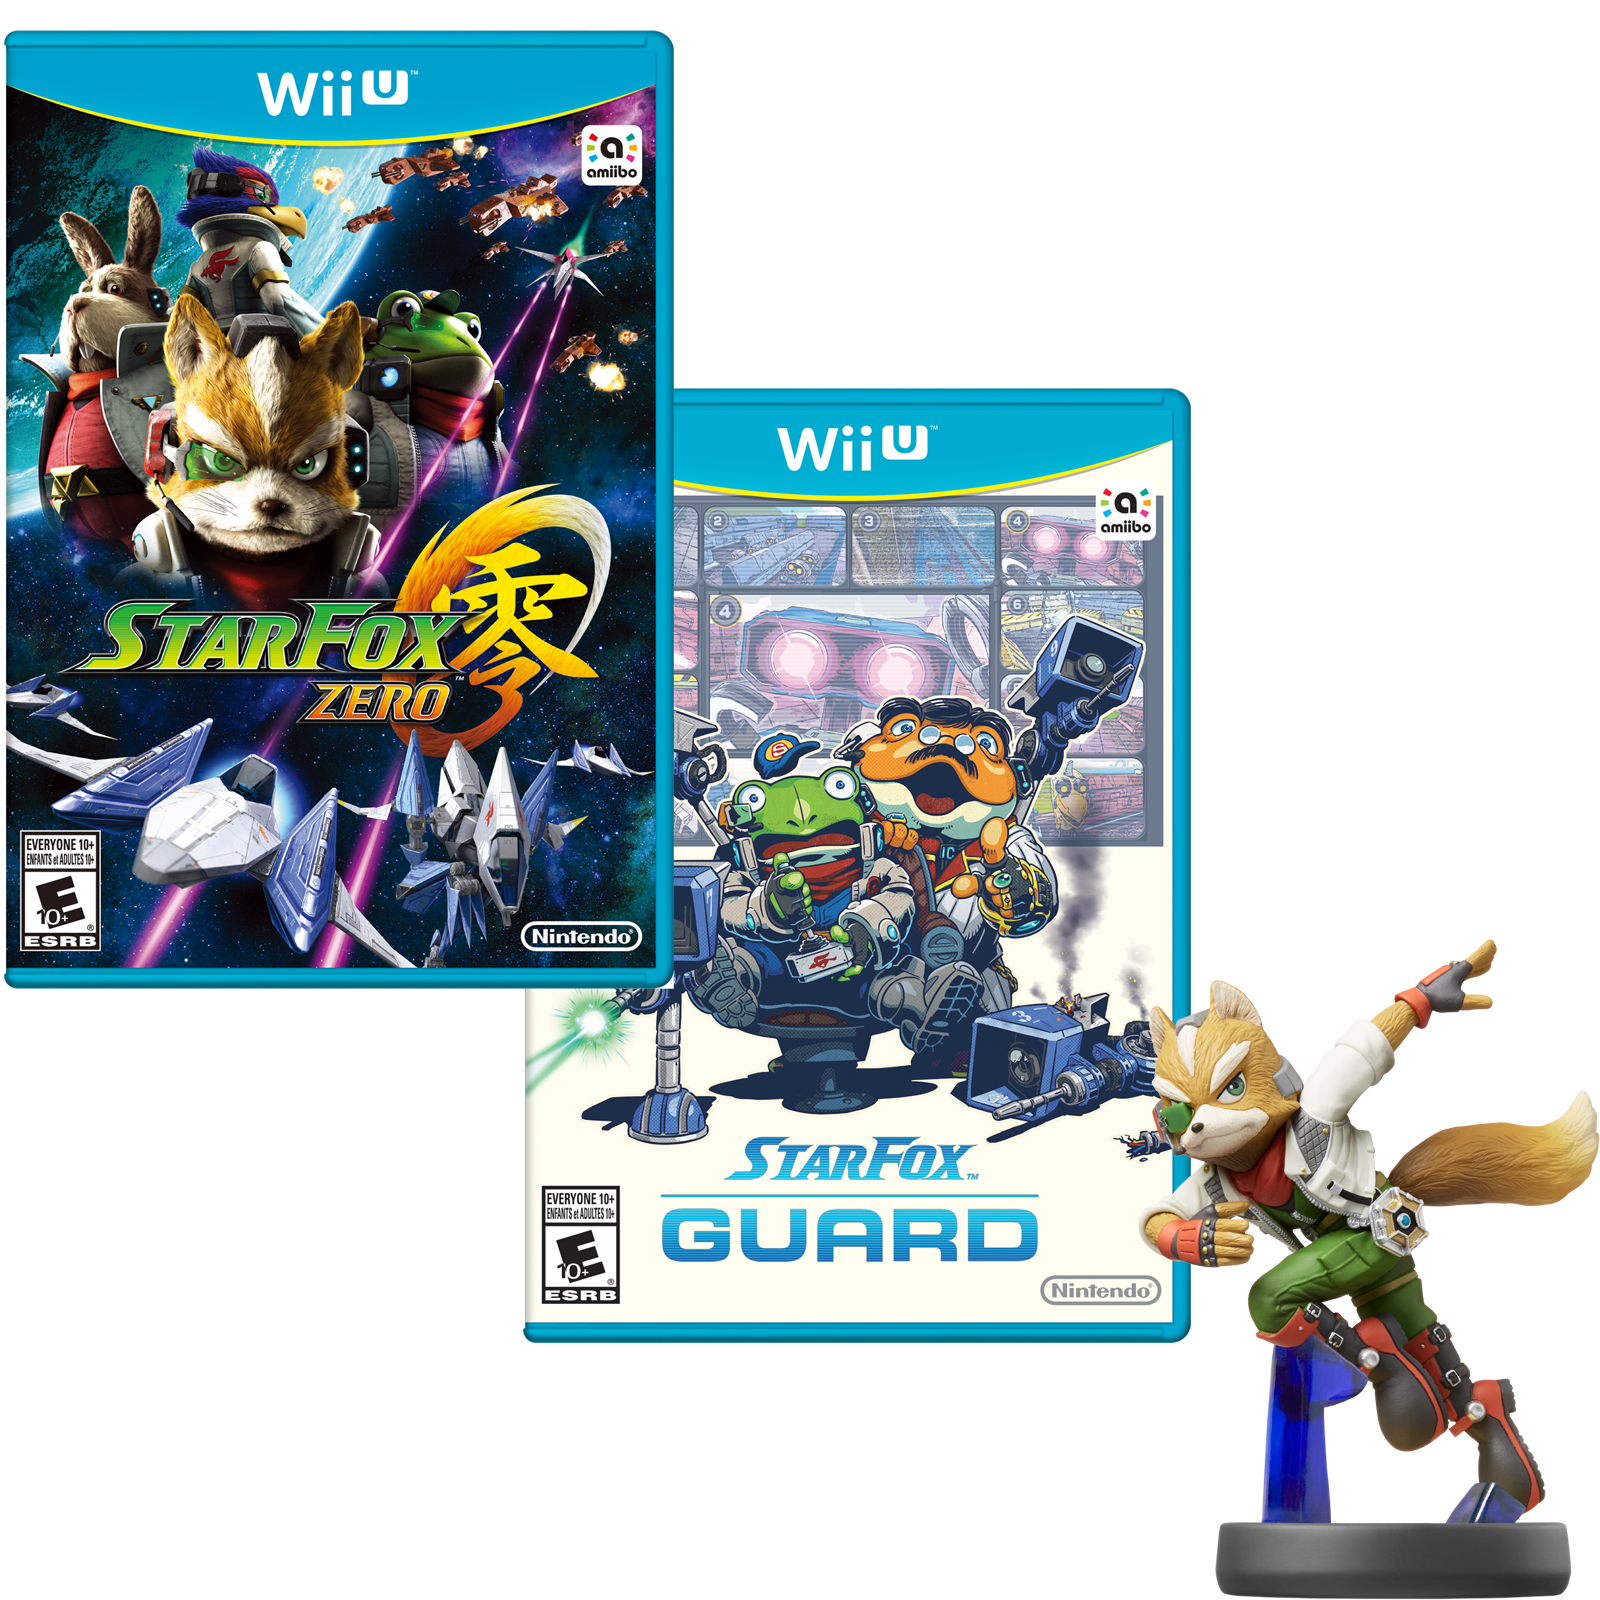 Star Fox Zero Star Fox Guard Fox Amiibo Bundle Wii U Buy Direct From Nintendo Star Bundle Amiibo Guard Zero Star Fox Amiibo Wii U